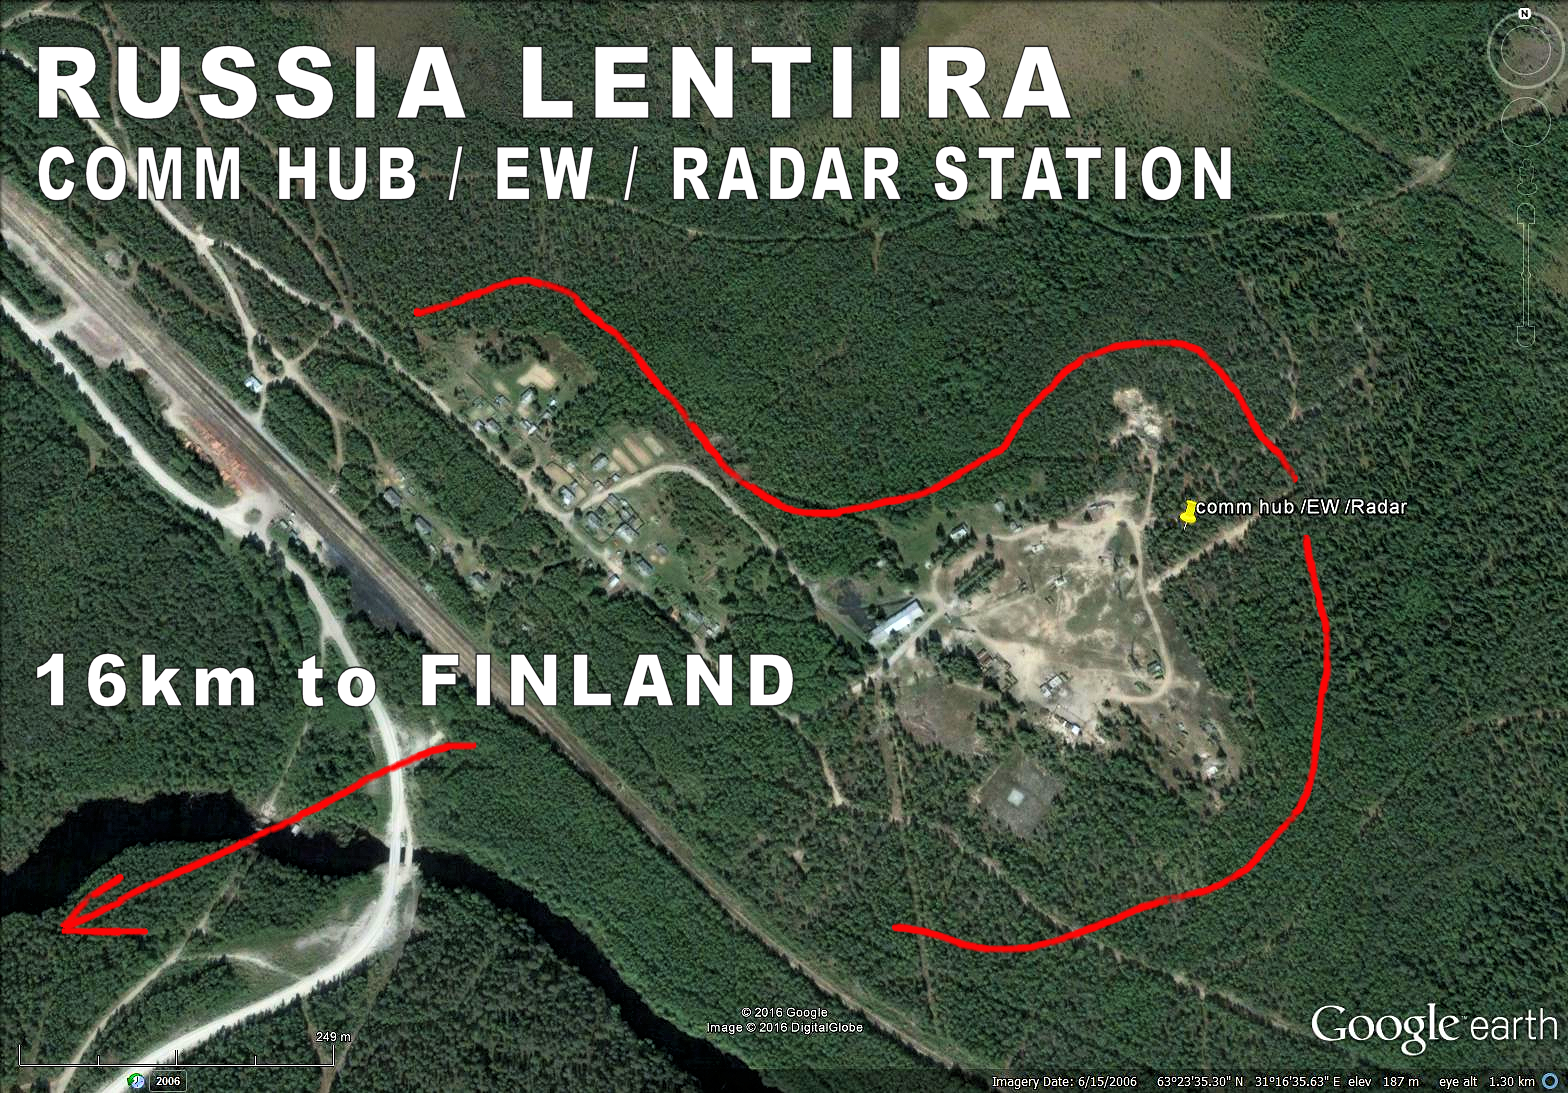 Russia Lentiira Lendery comm hub EW